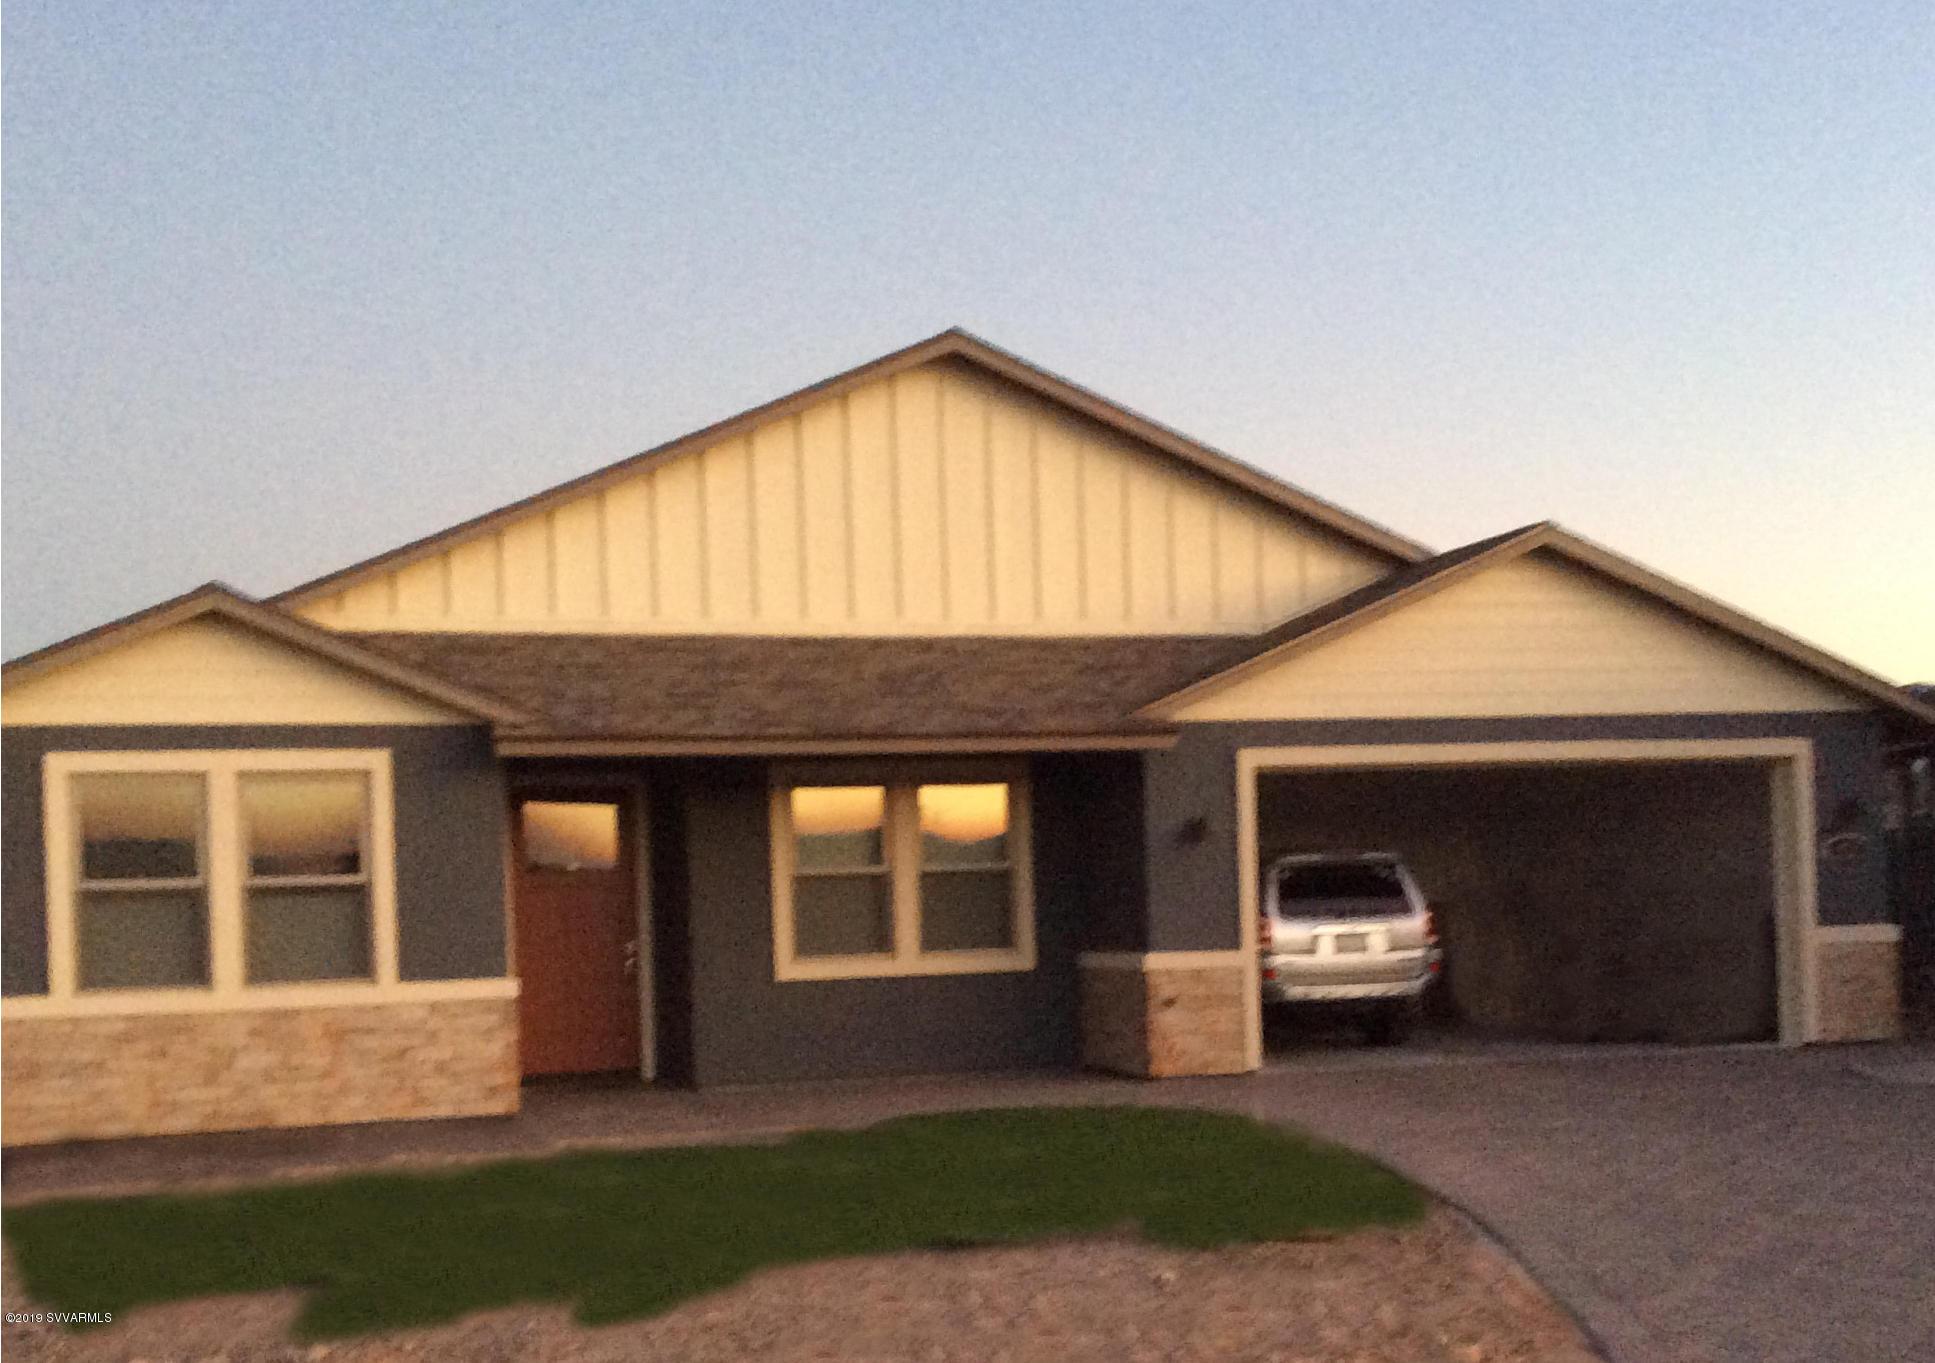 455 Kindra Court #Lot 11 Cottonwood, AZ 86326